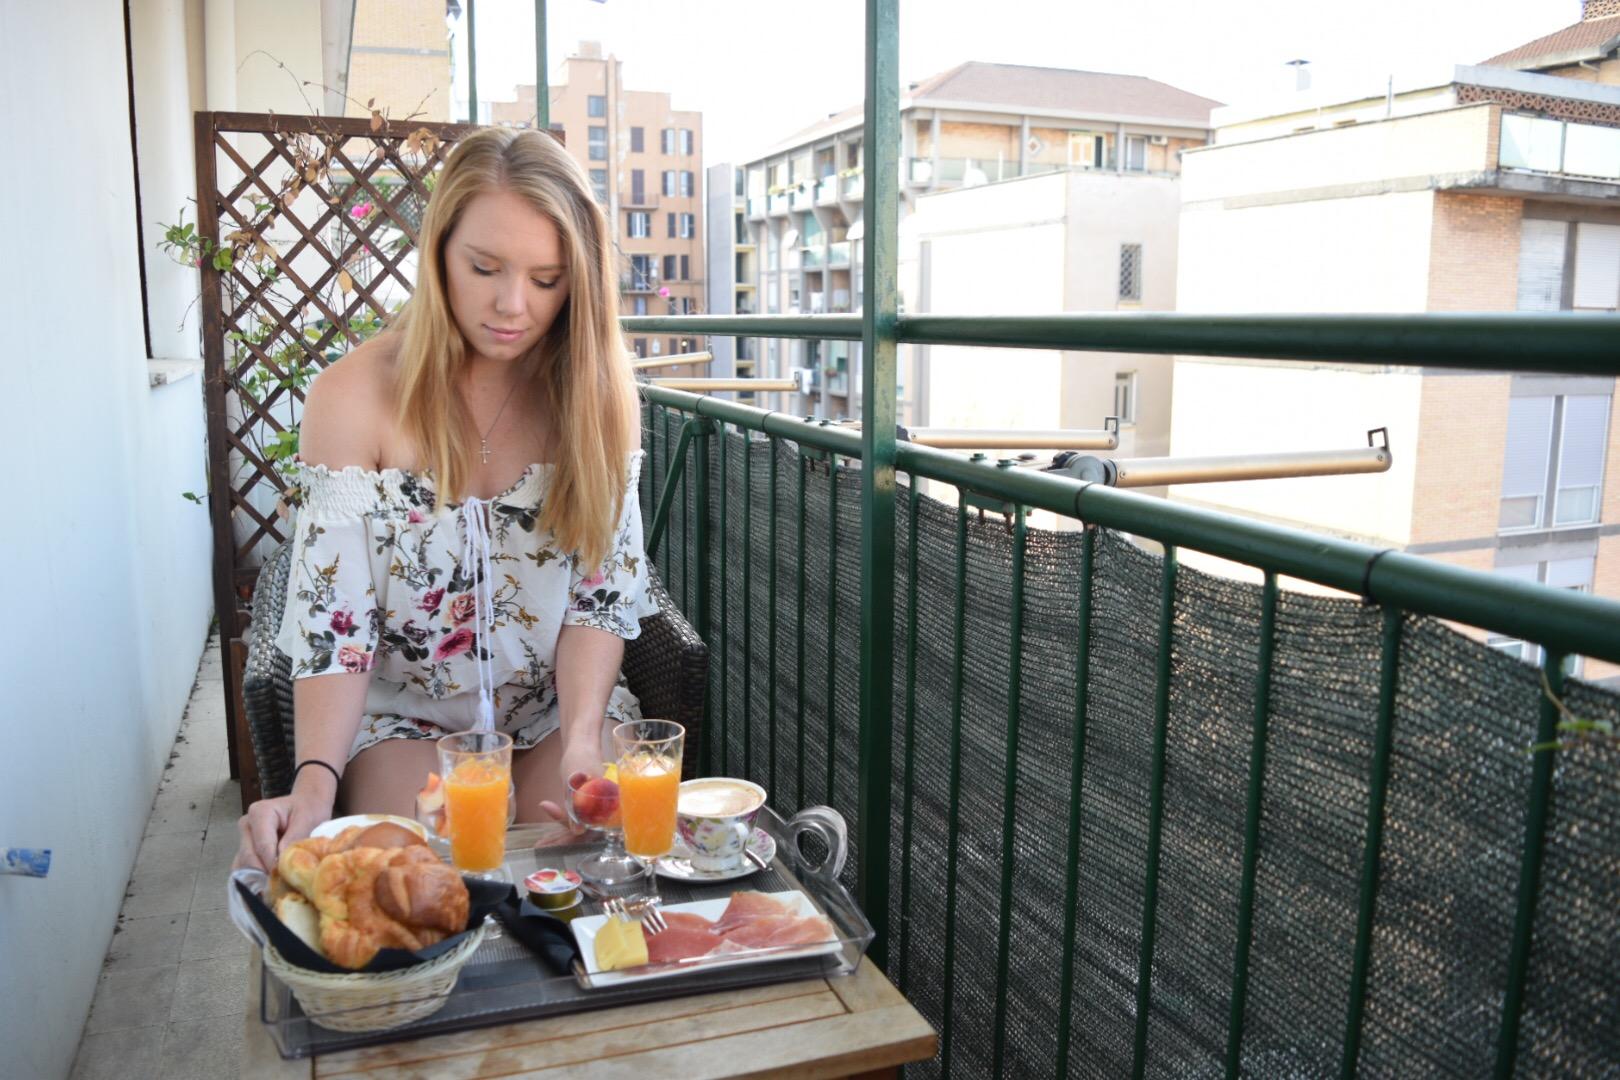 Day 2:  Breakfast Enjoyed on the Balcony